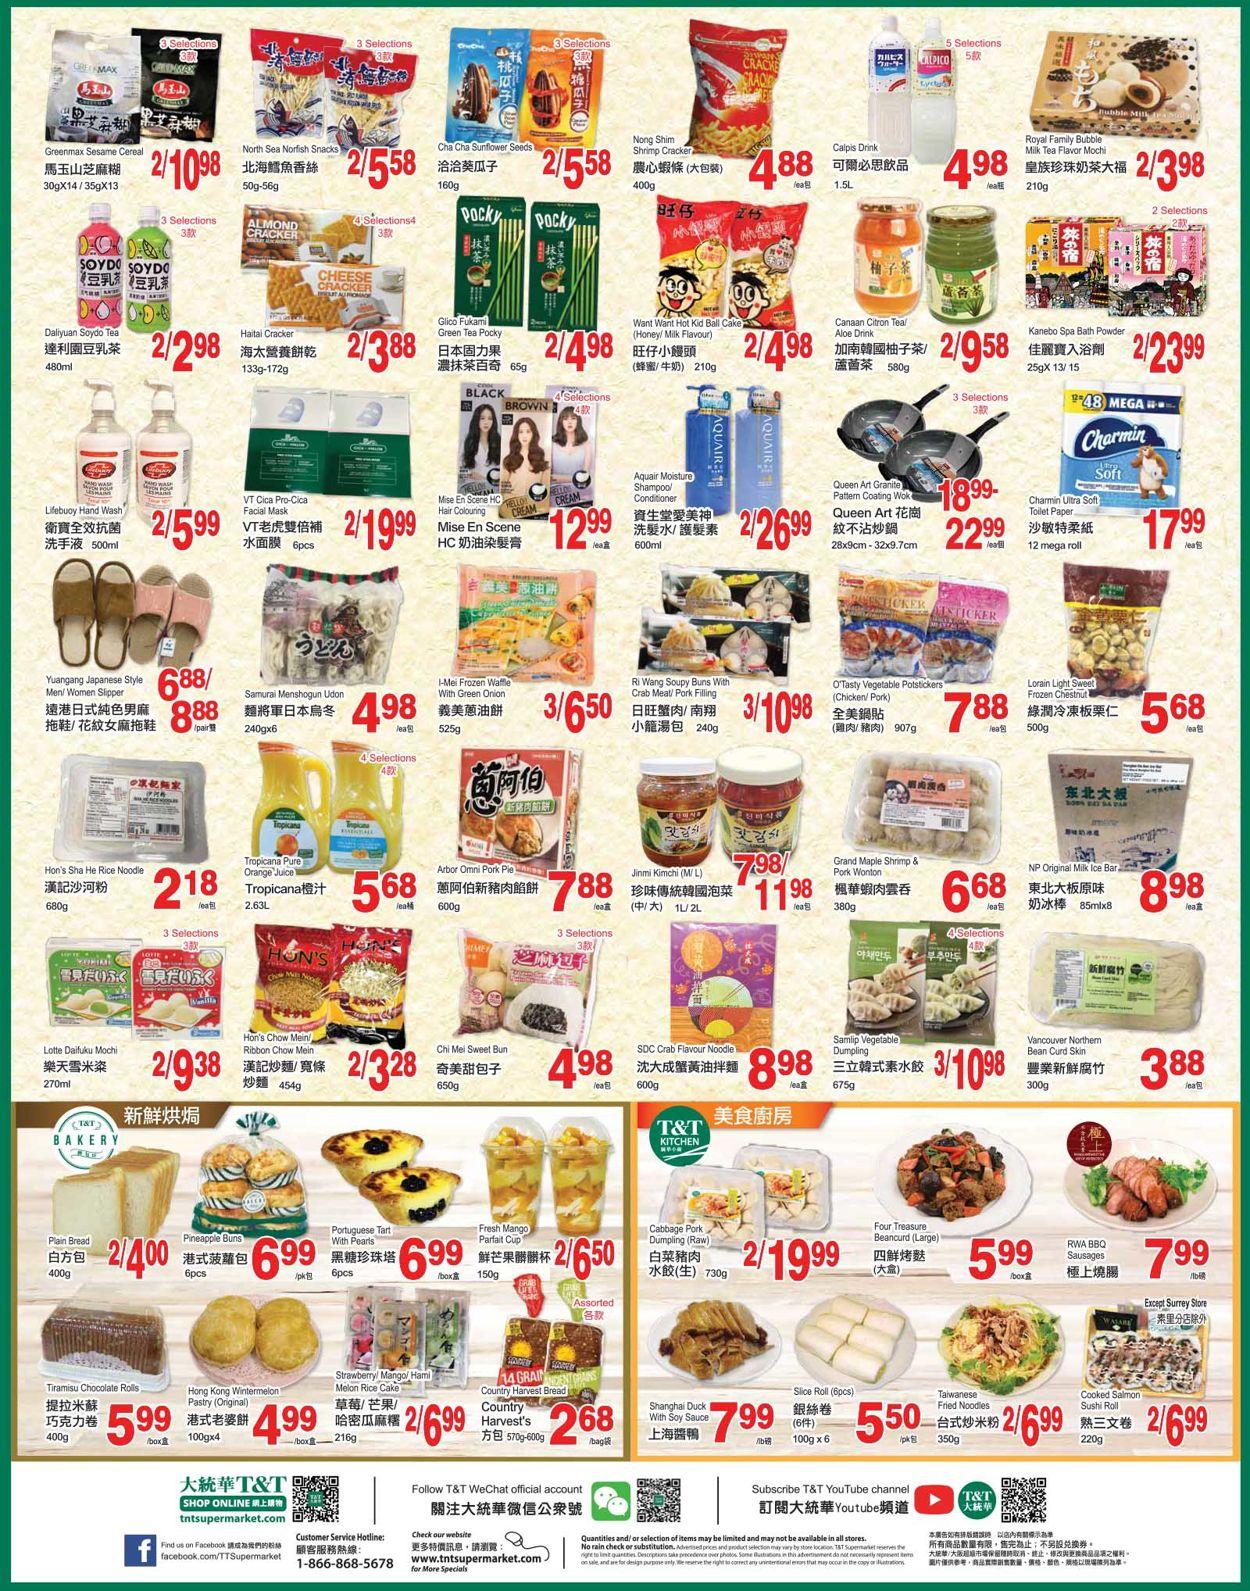 T&T Supermarket - British Columbia Flyer - 06/11-06/17/2021 (Page 3)